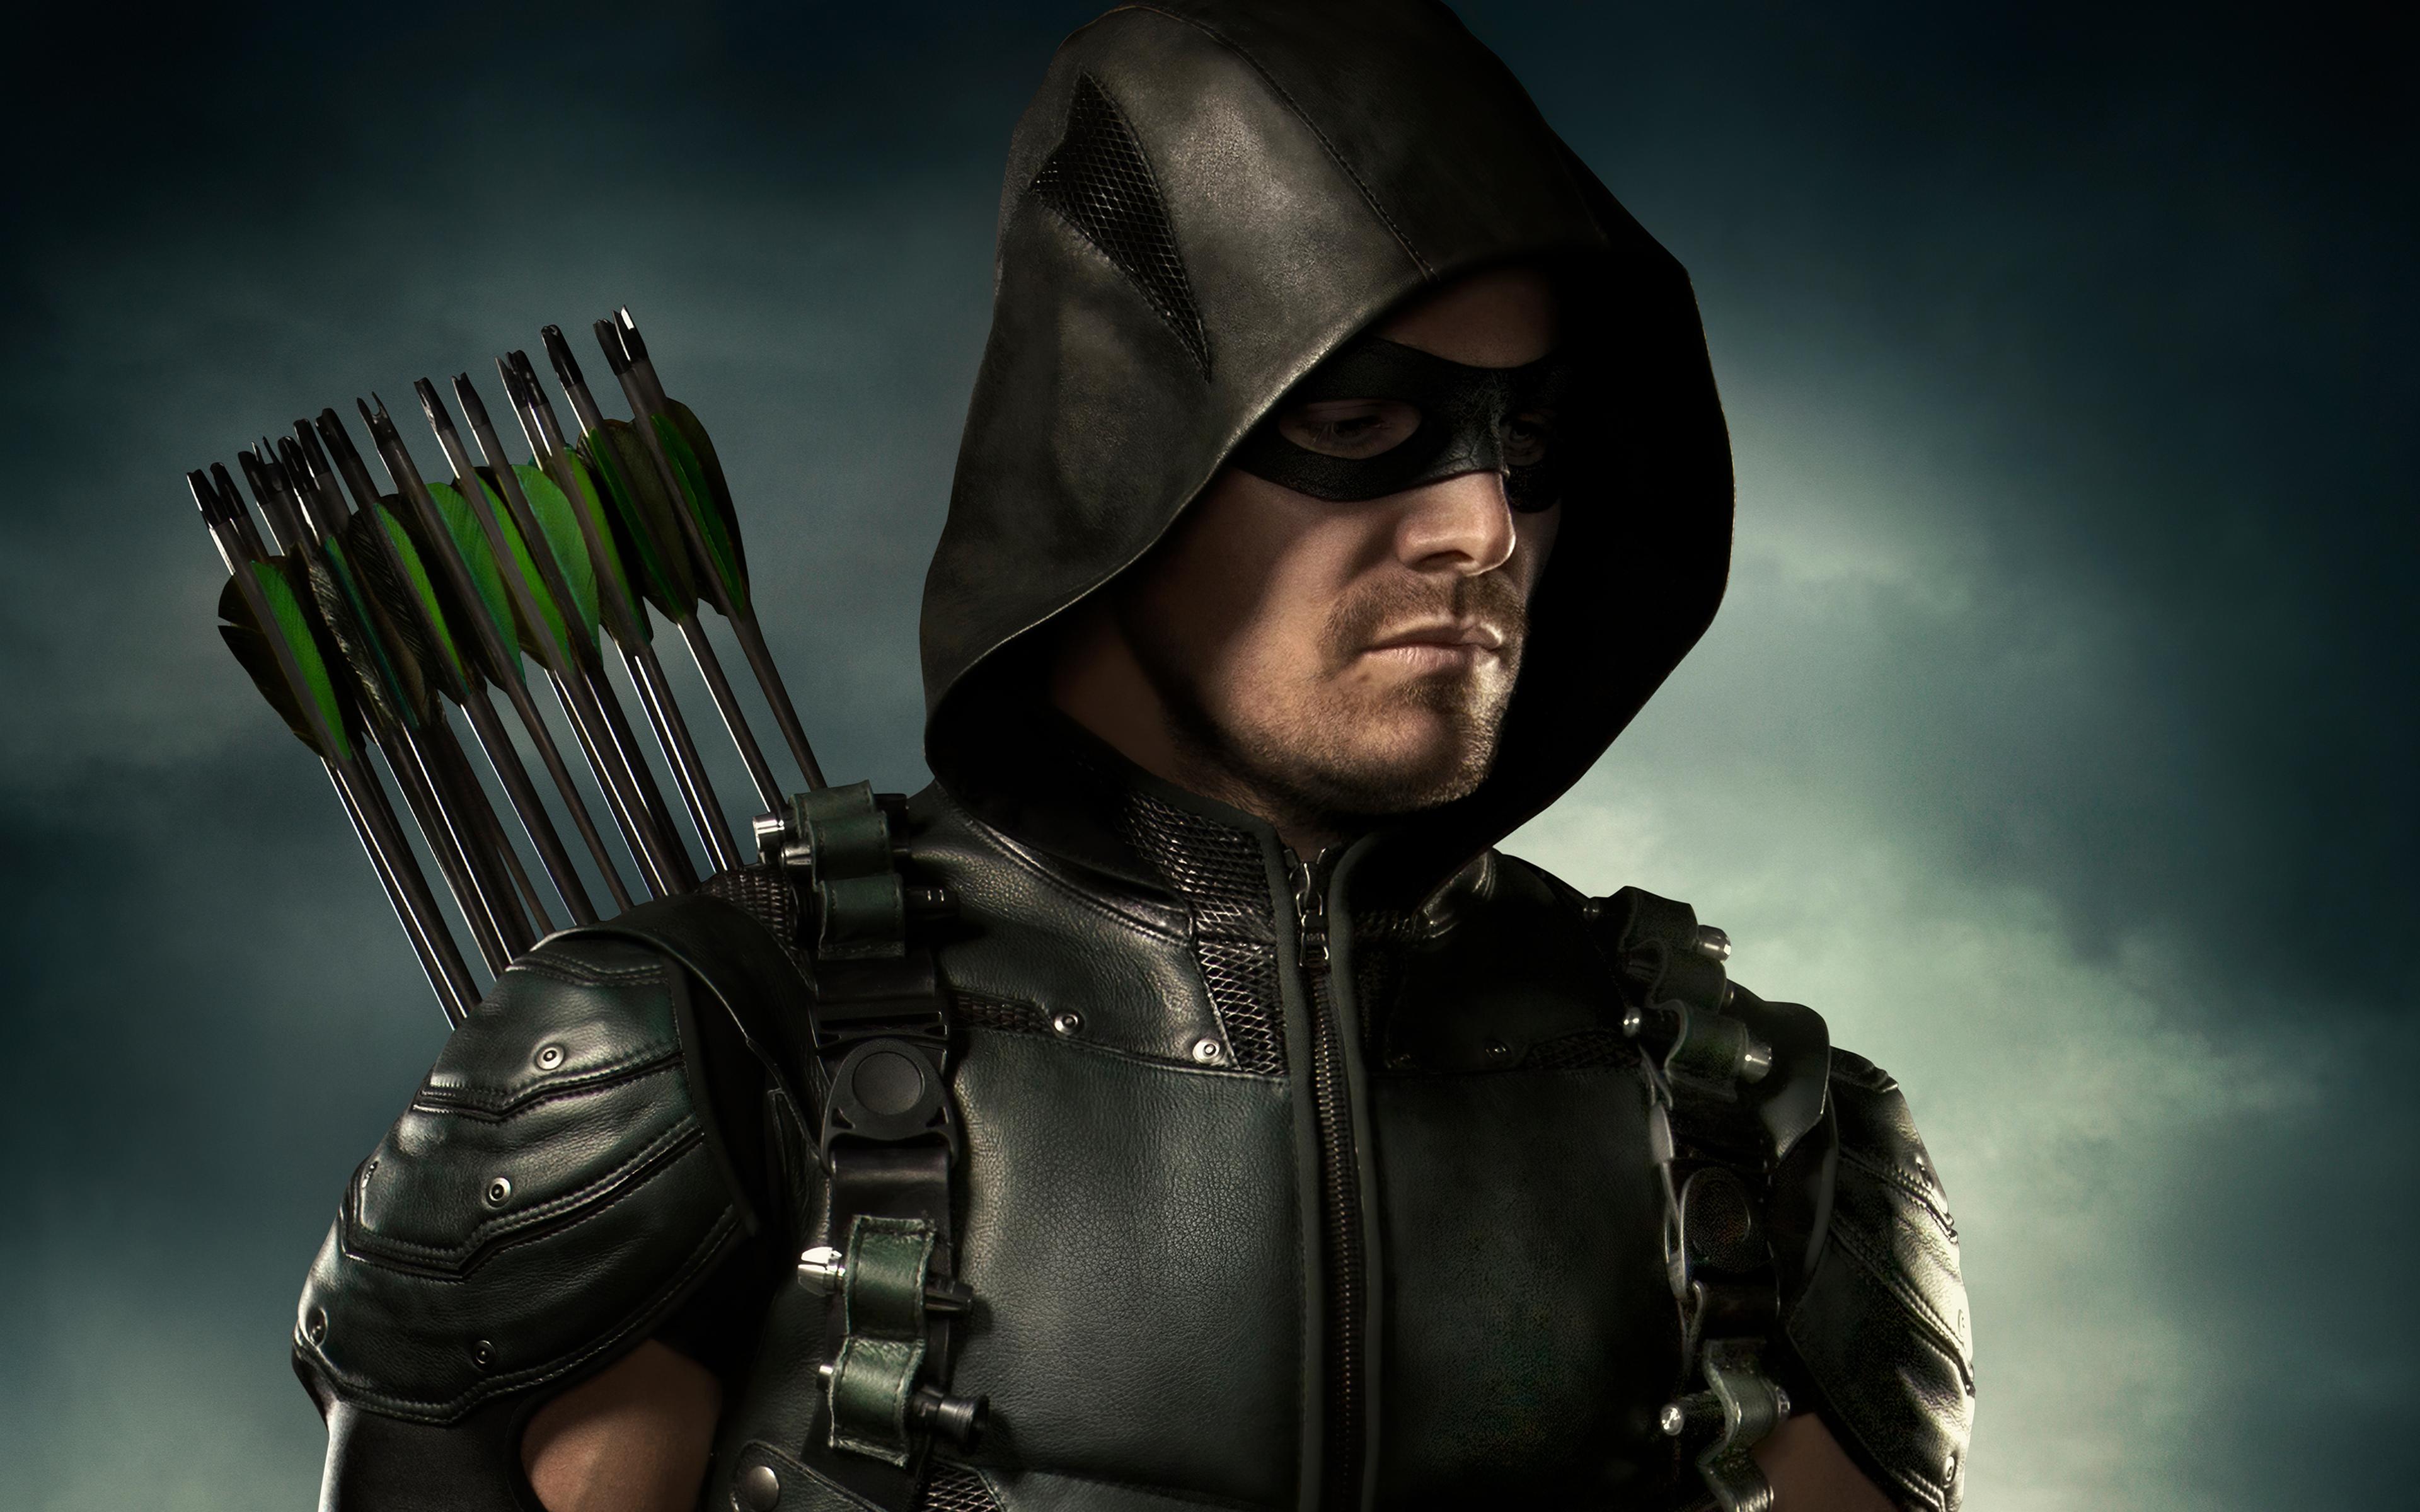 arrow-season-8-poster-4k-pd.jpg